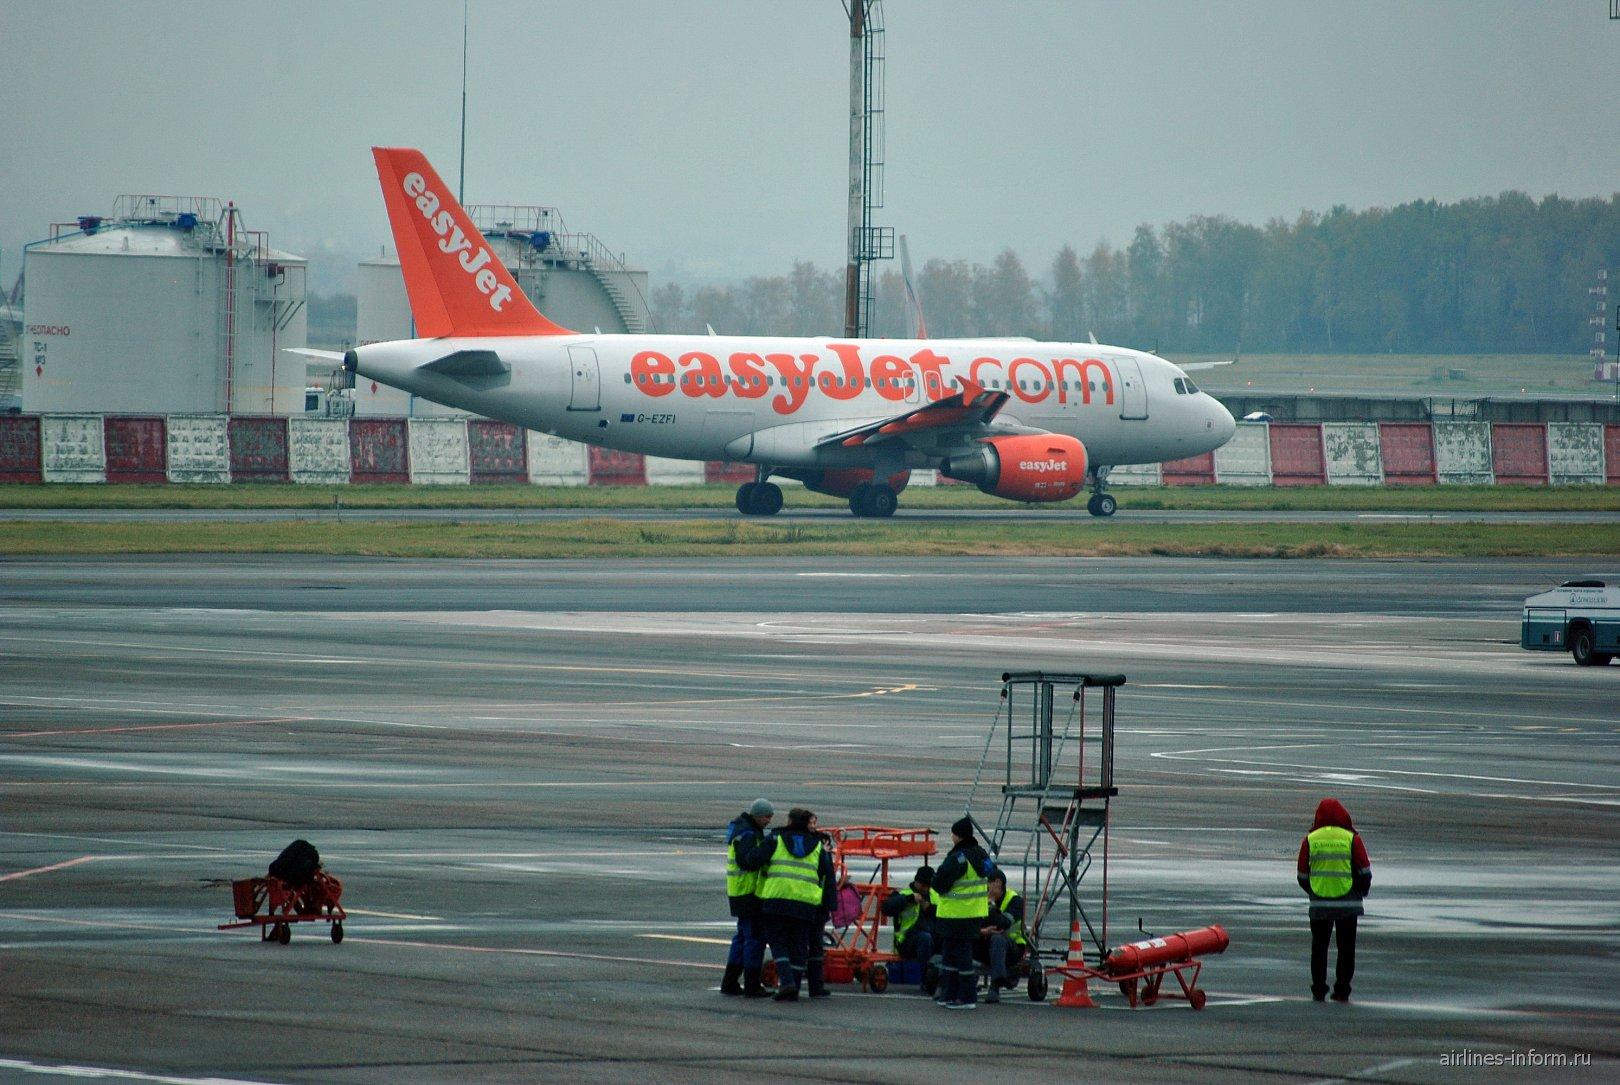 Airbus A319 авиакомпании easyJet в аэропорту Домодедово